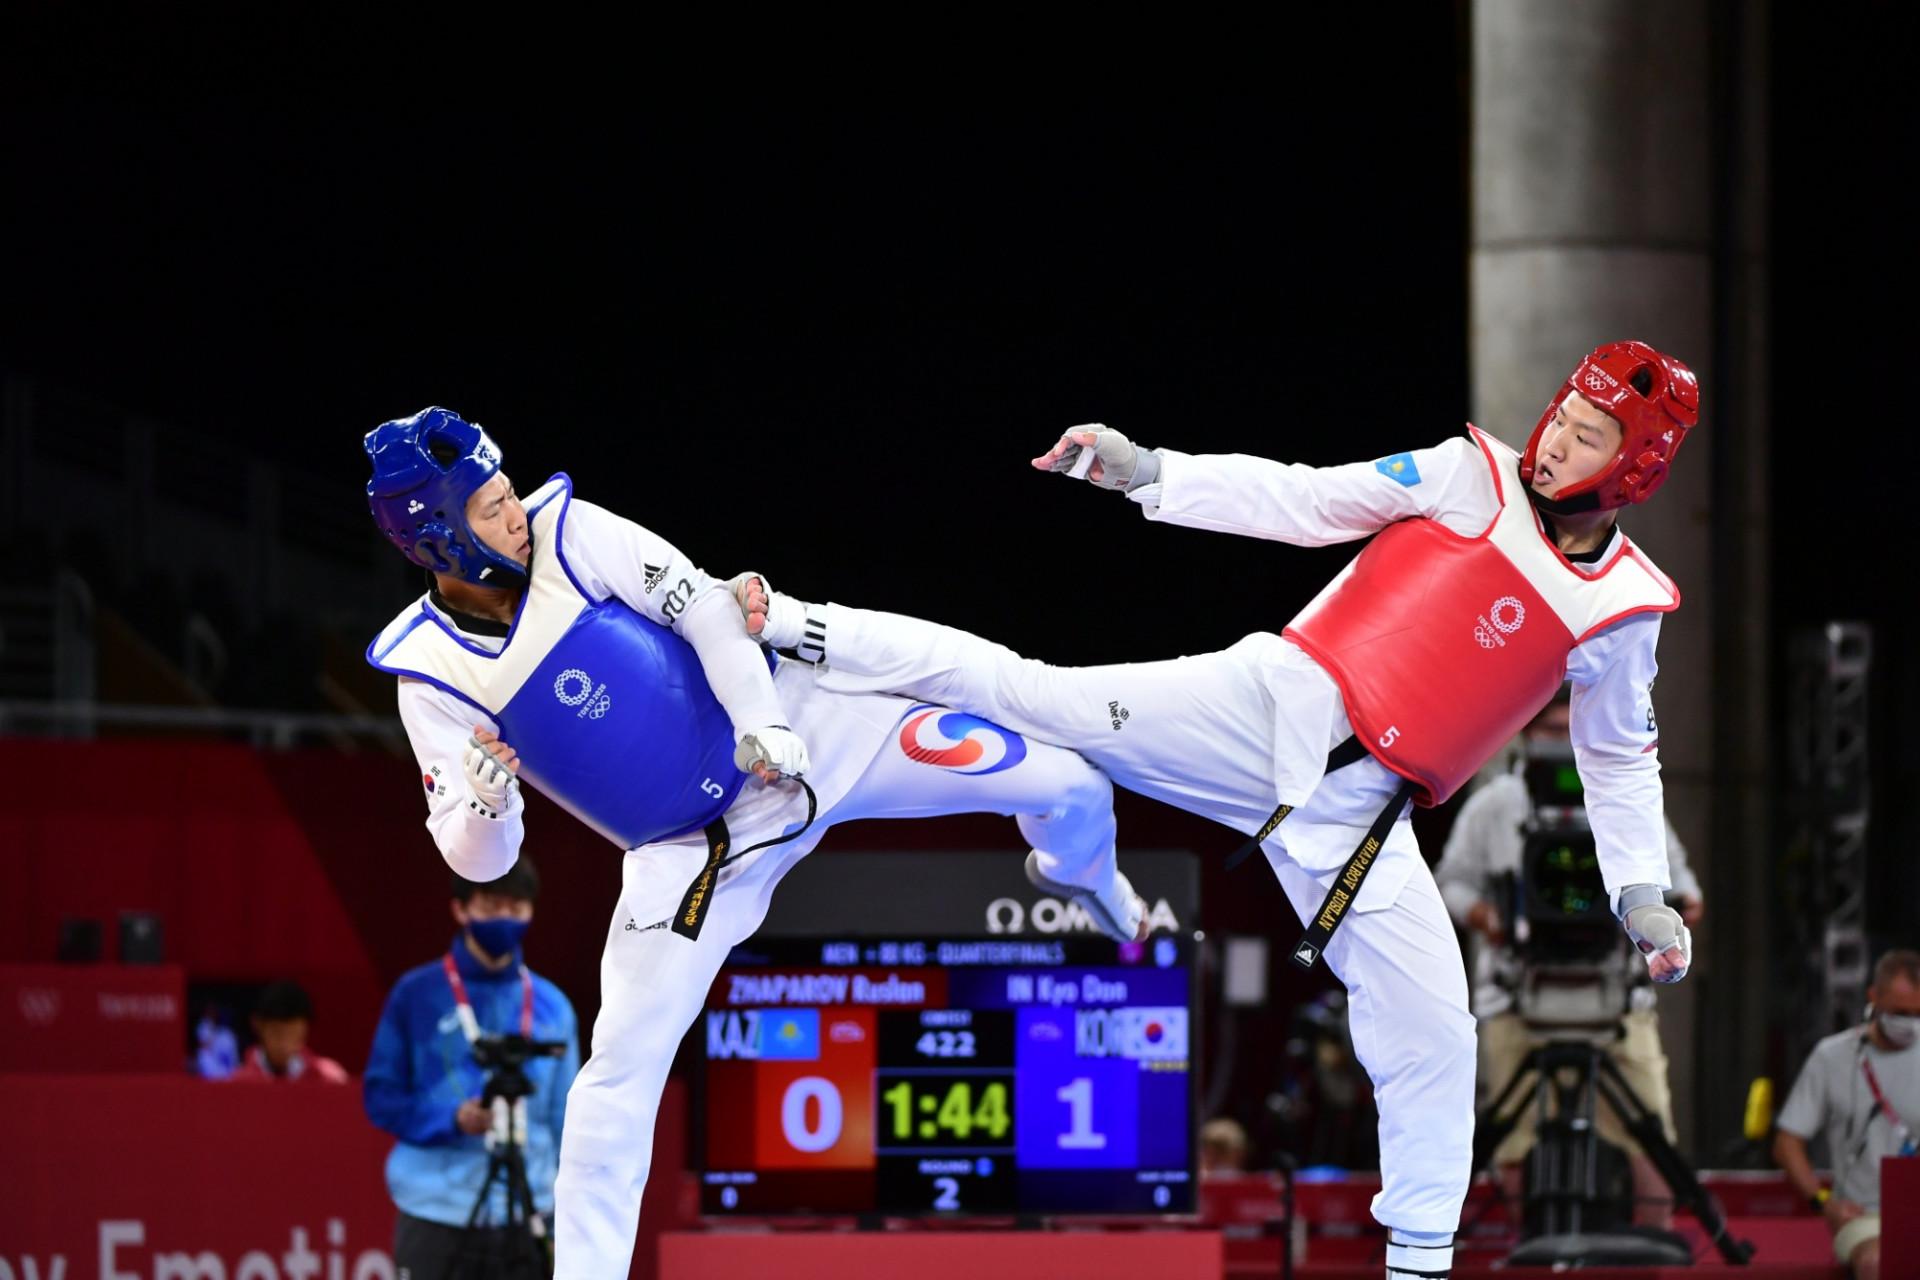 Токио-2020: Руслан Жапаров уступил во втором круге турнира